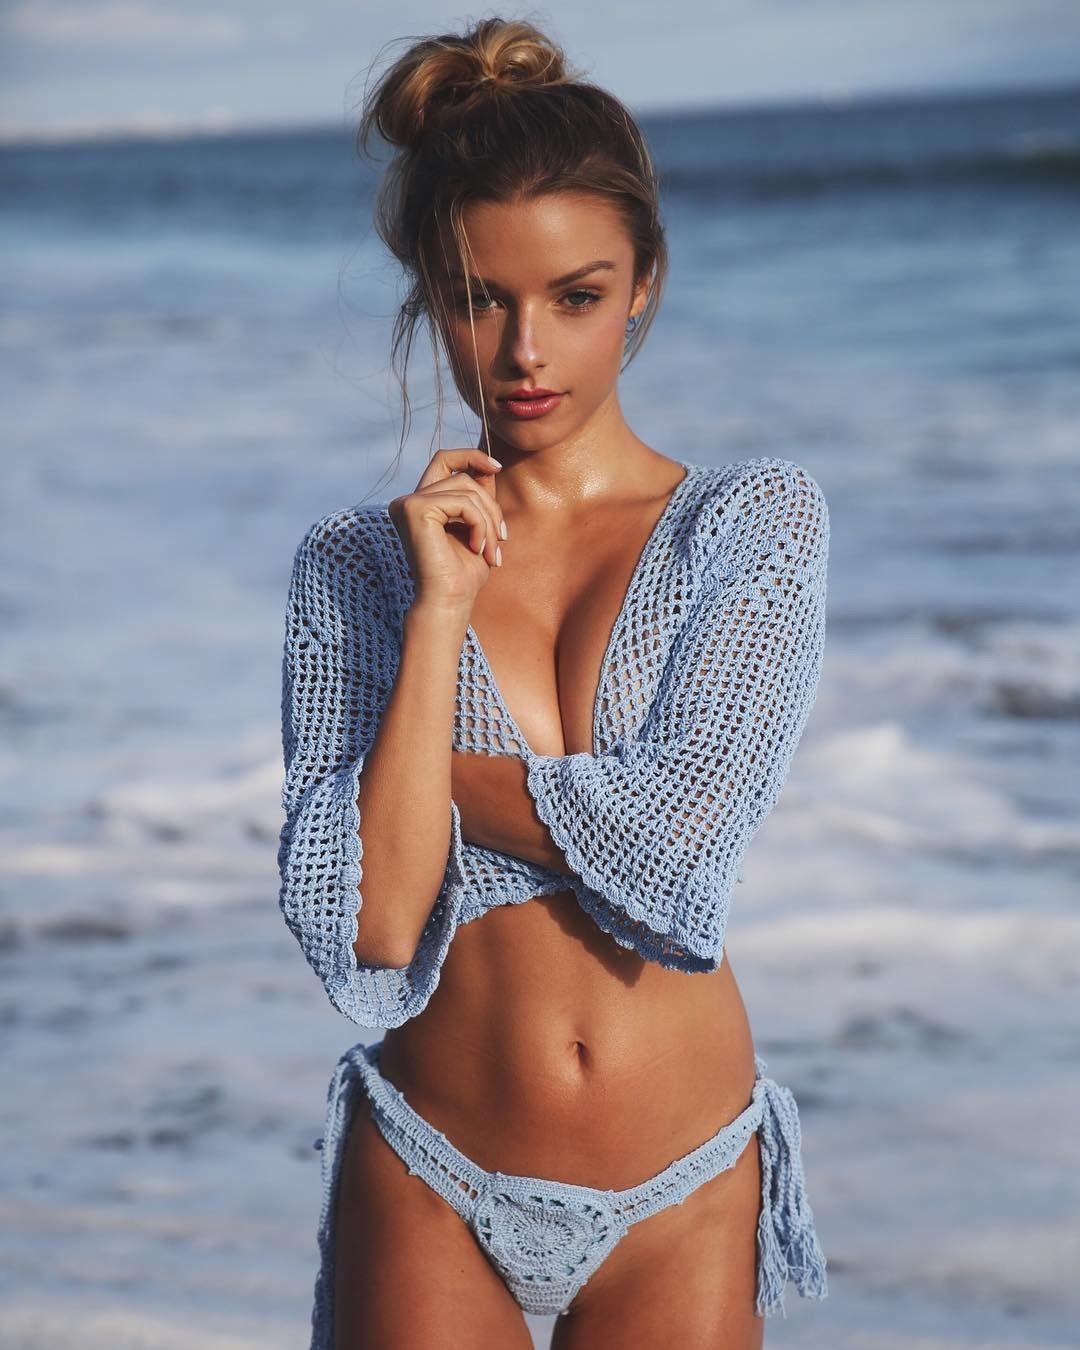 eb1b14f20 Discover ideas about Bikini Swimwear